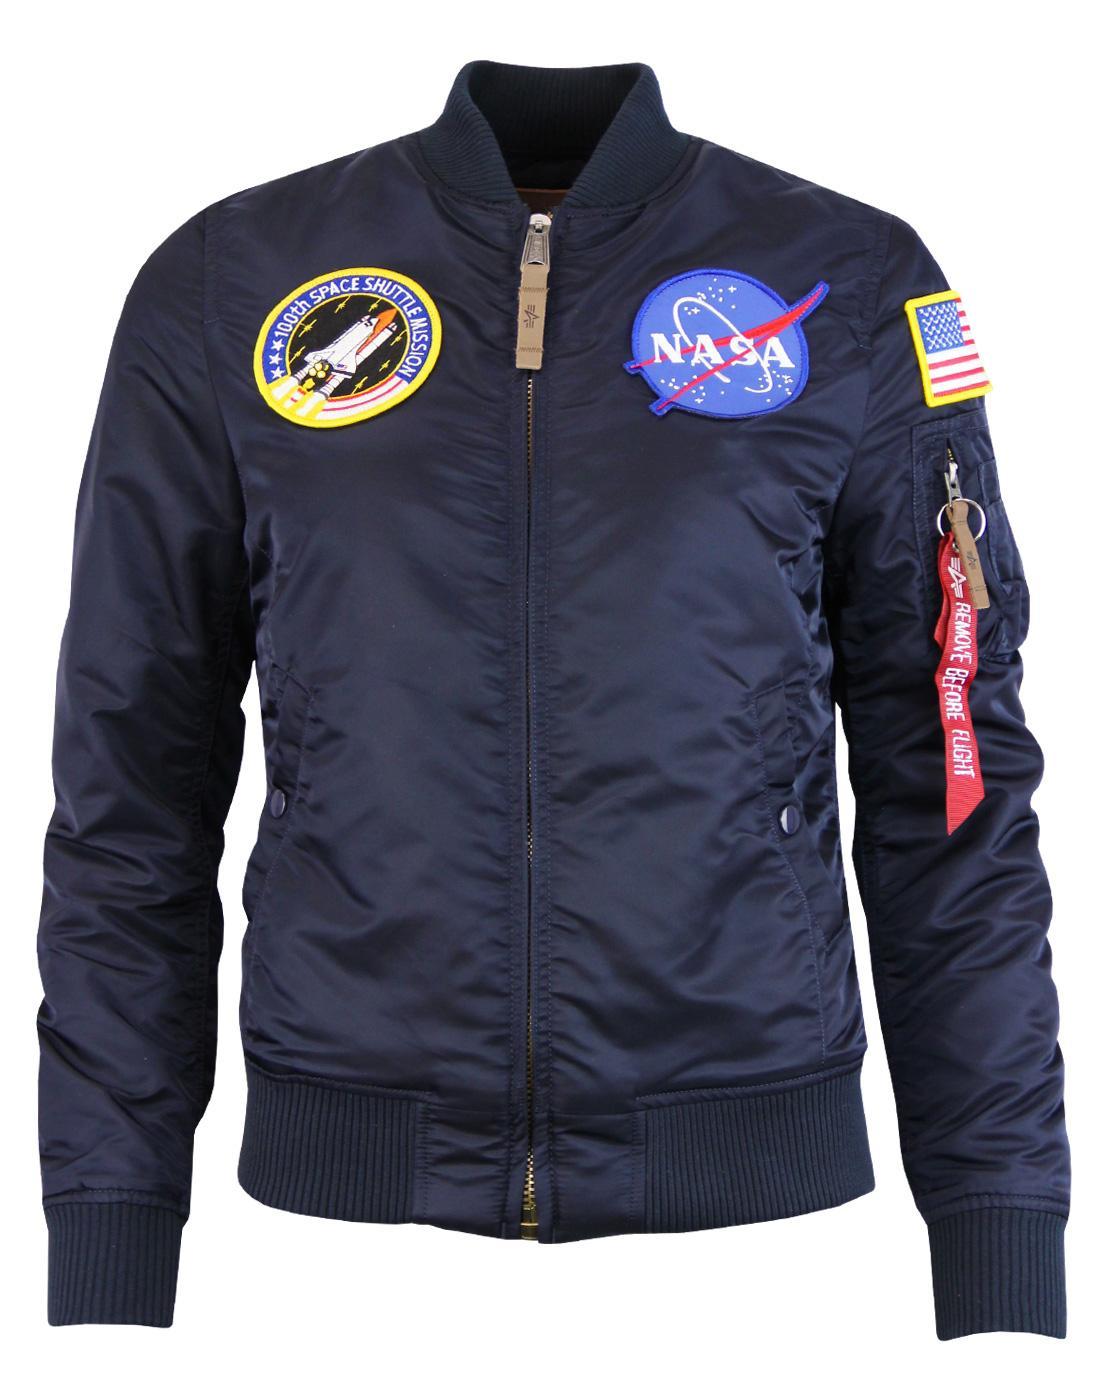 MA1 NASA ALPHA INDUSTRIES Womens Bomber Jacket RB